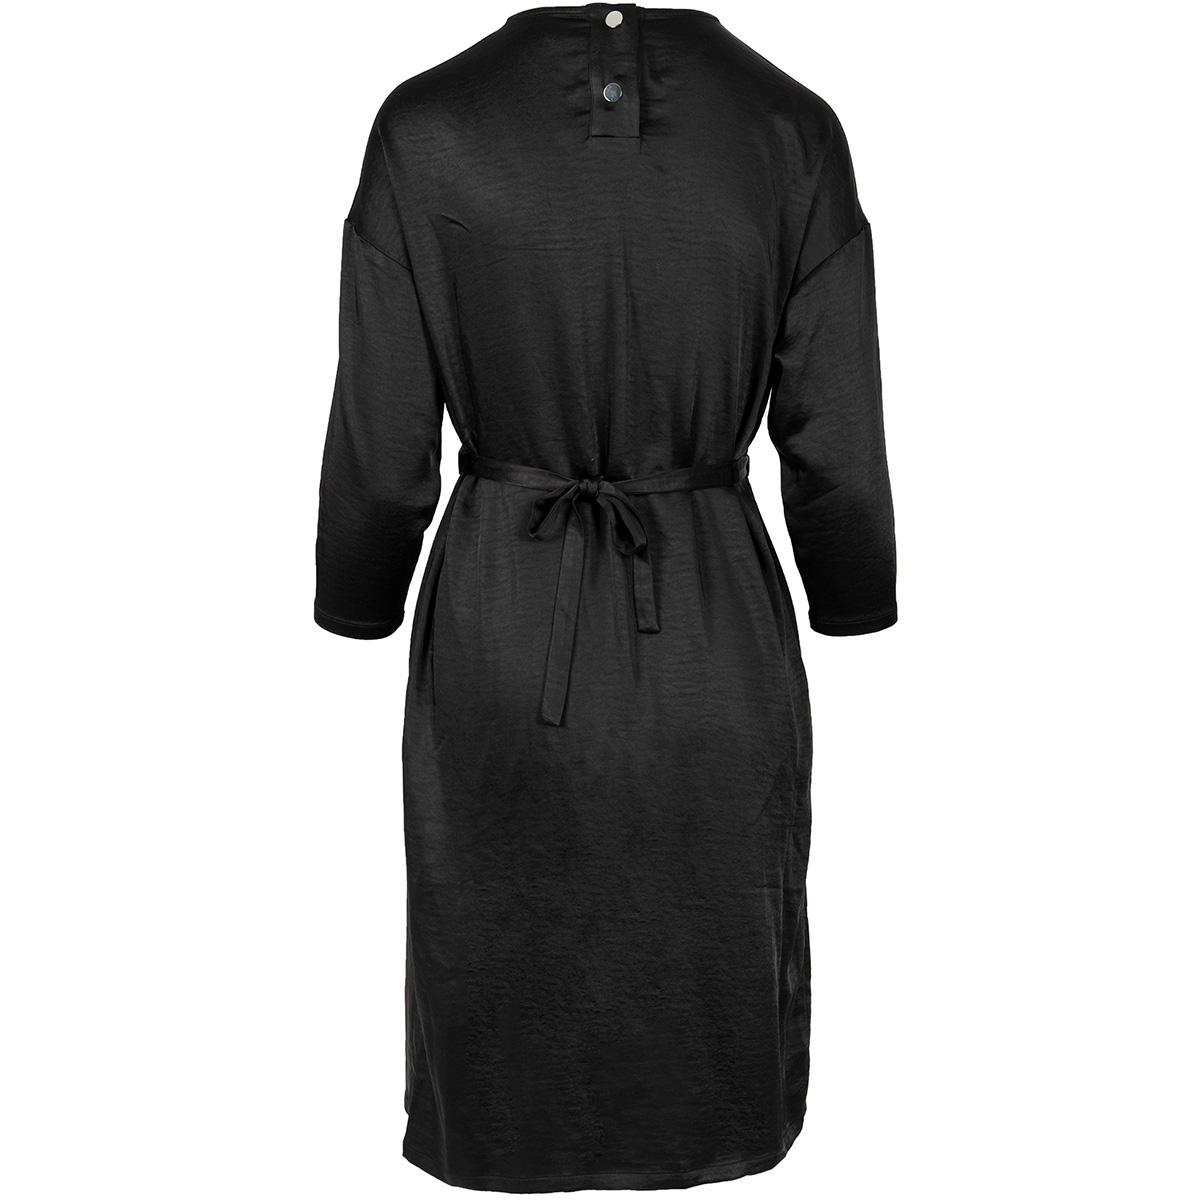 feestelijk jurkje 03fj19nazw zusss jurk zwart